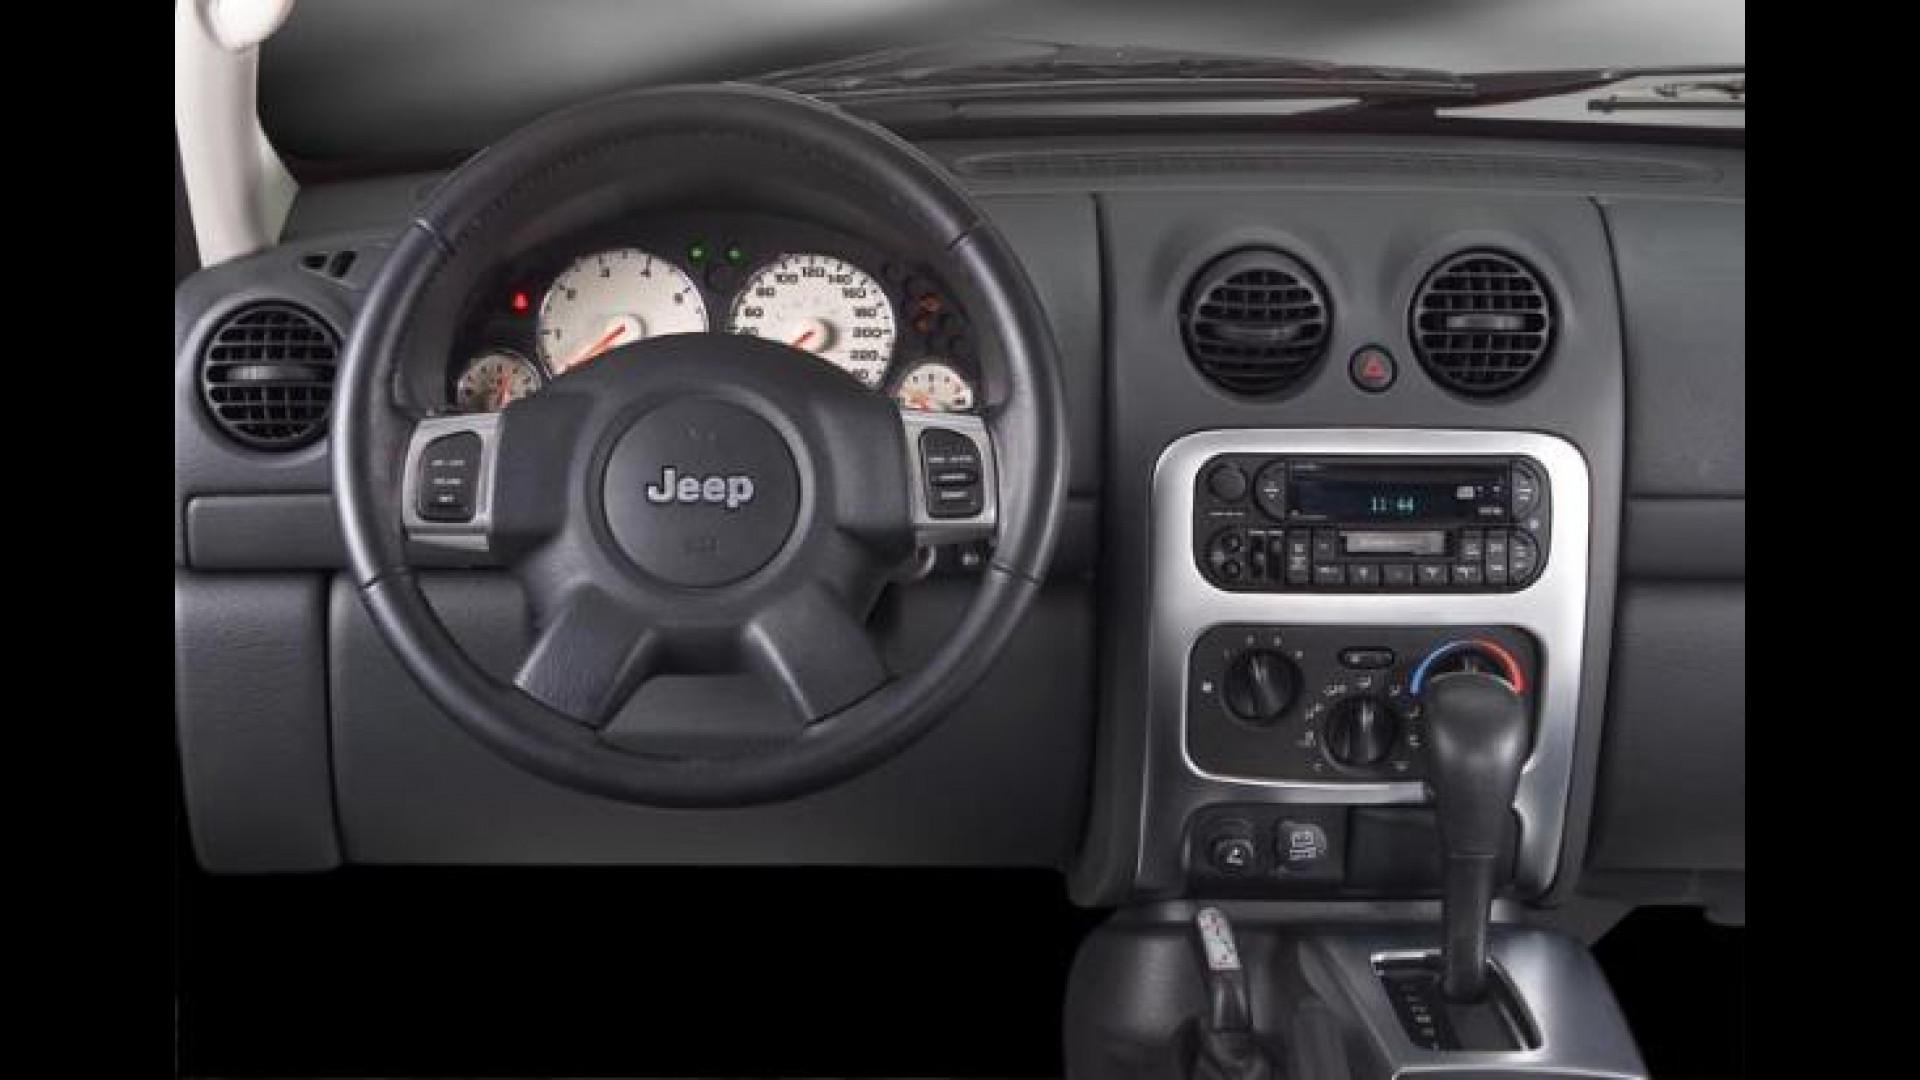 Schema Elettrico Jeep Cherokee Kj : Glow plug module change l jeep grand cherokee youtube